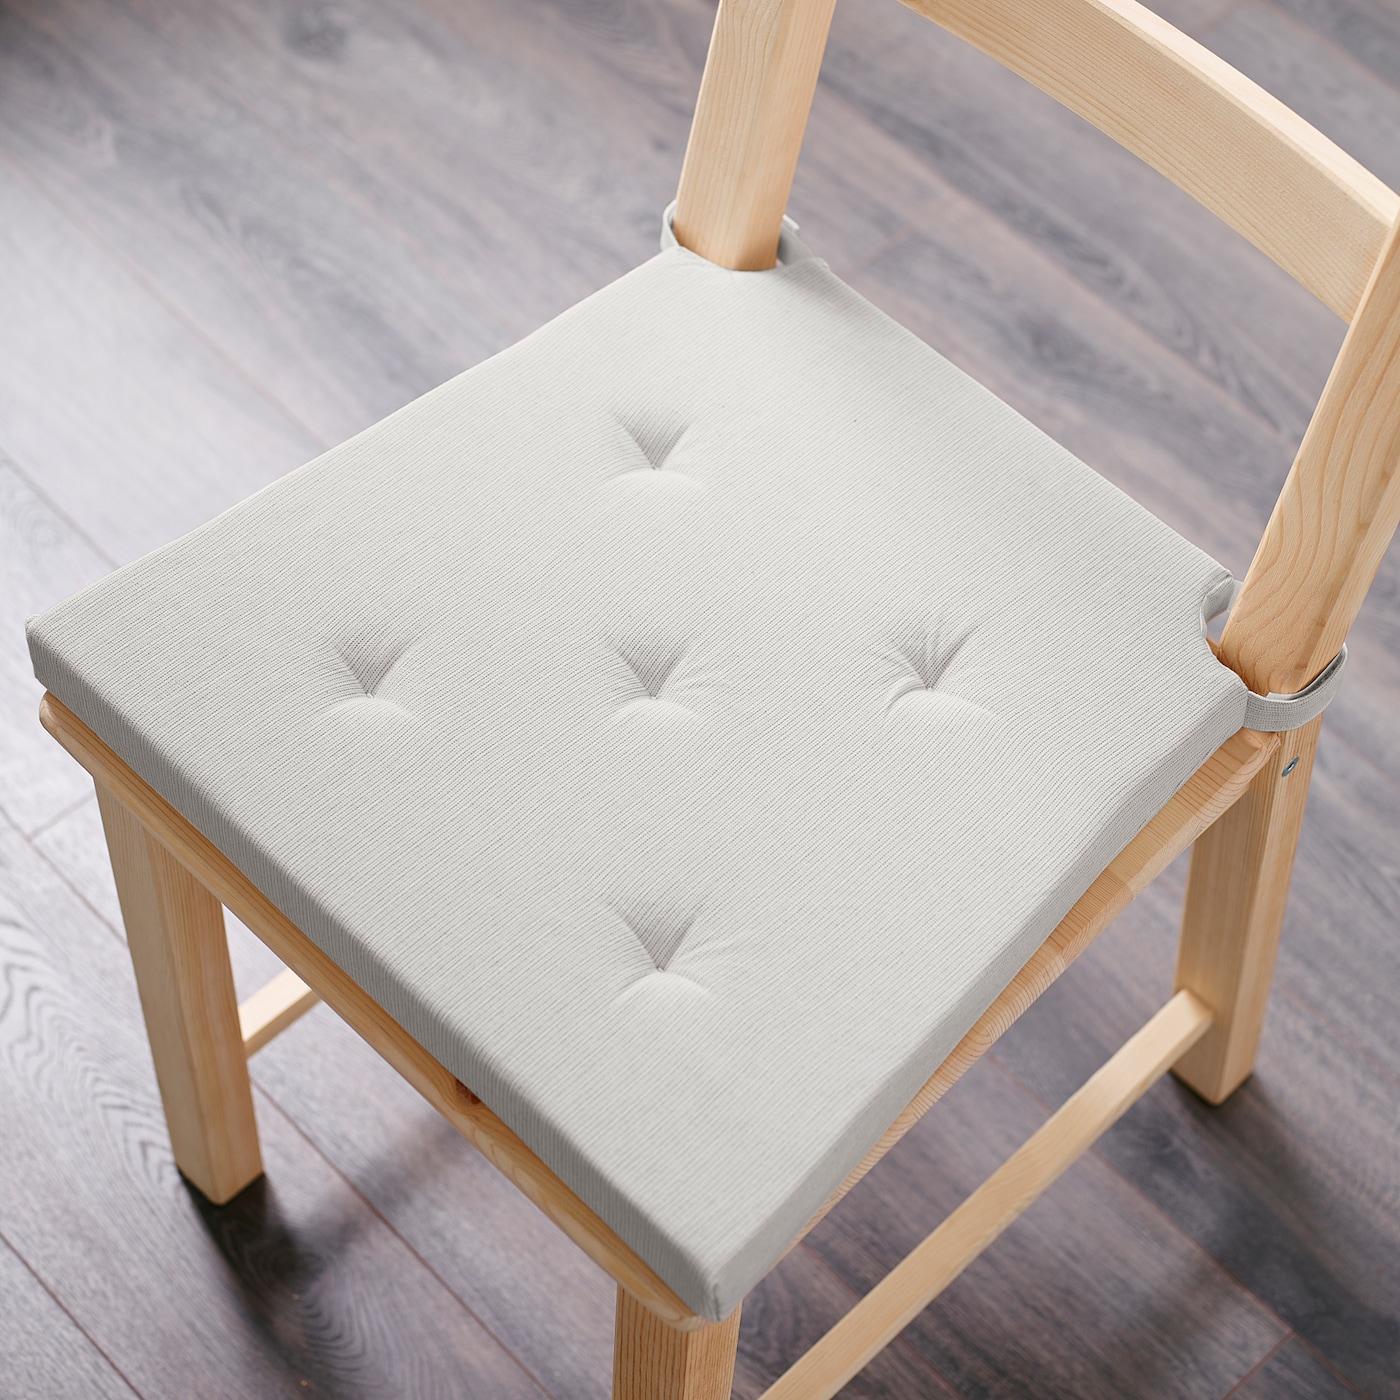 JUSTINA Carreau de chaise, naturel, 3542x40x4 IKEA